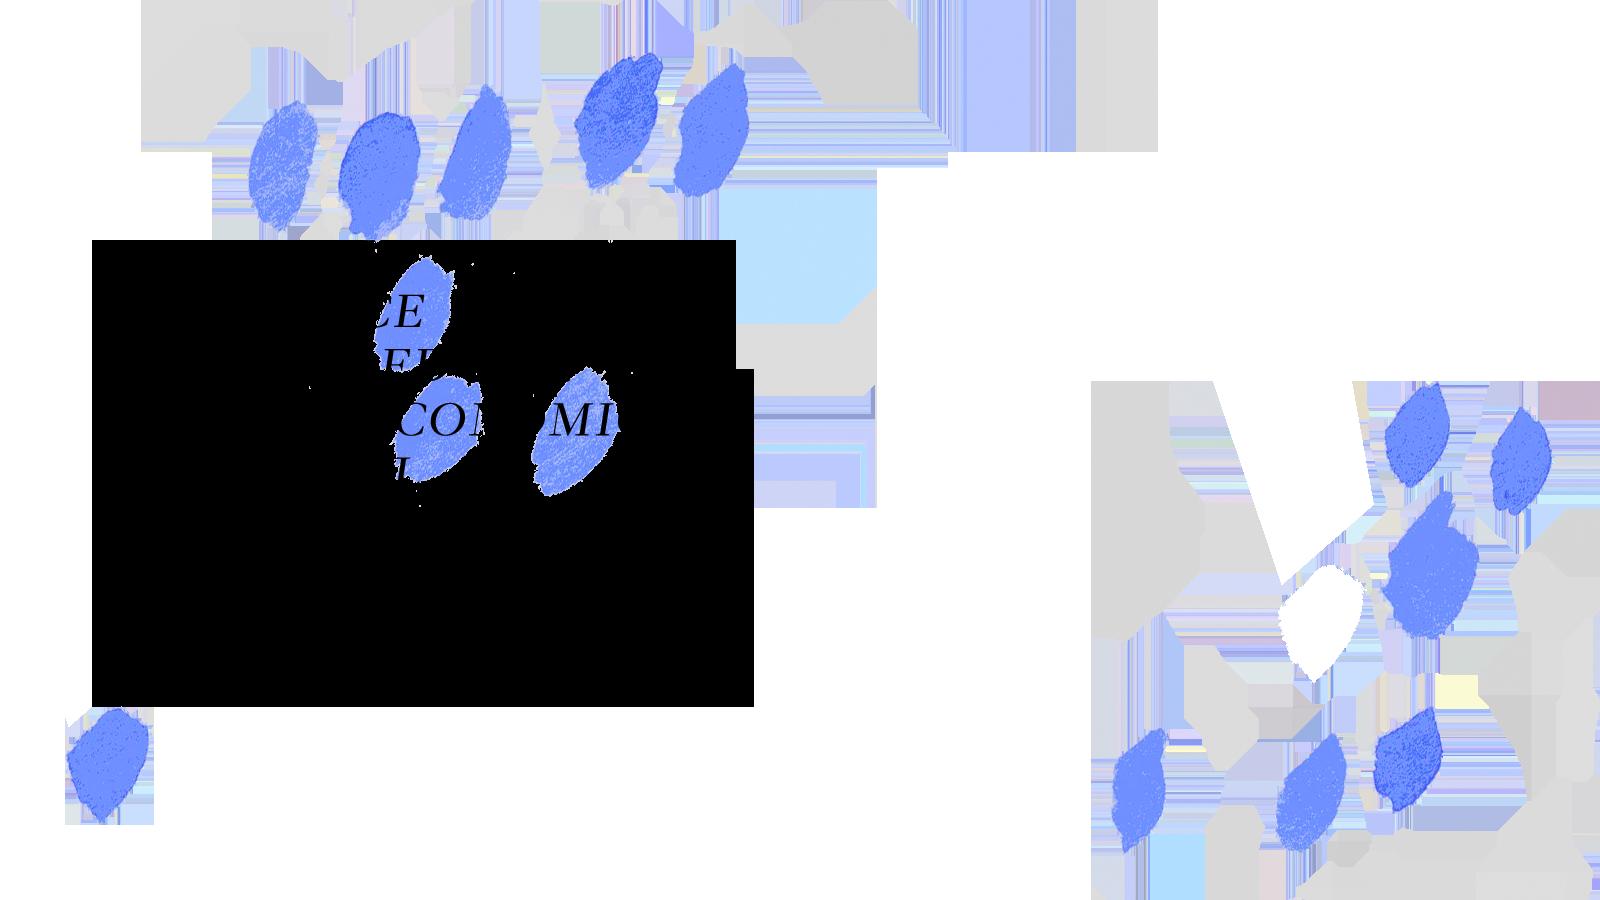 blu05